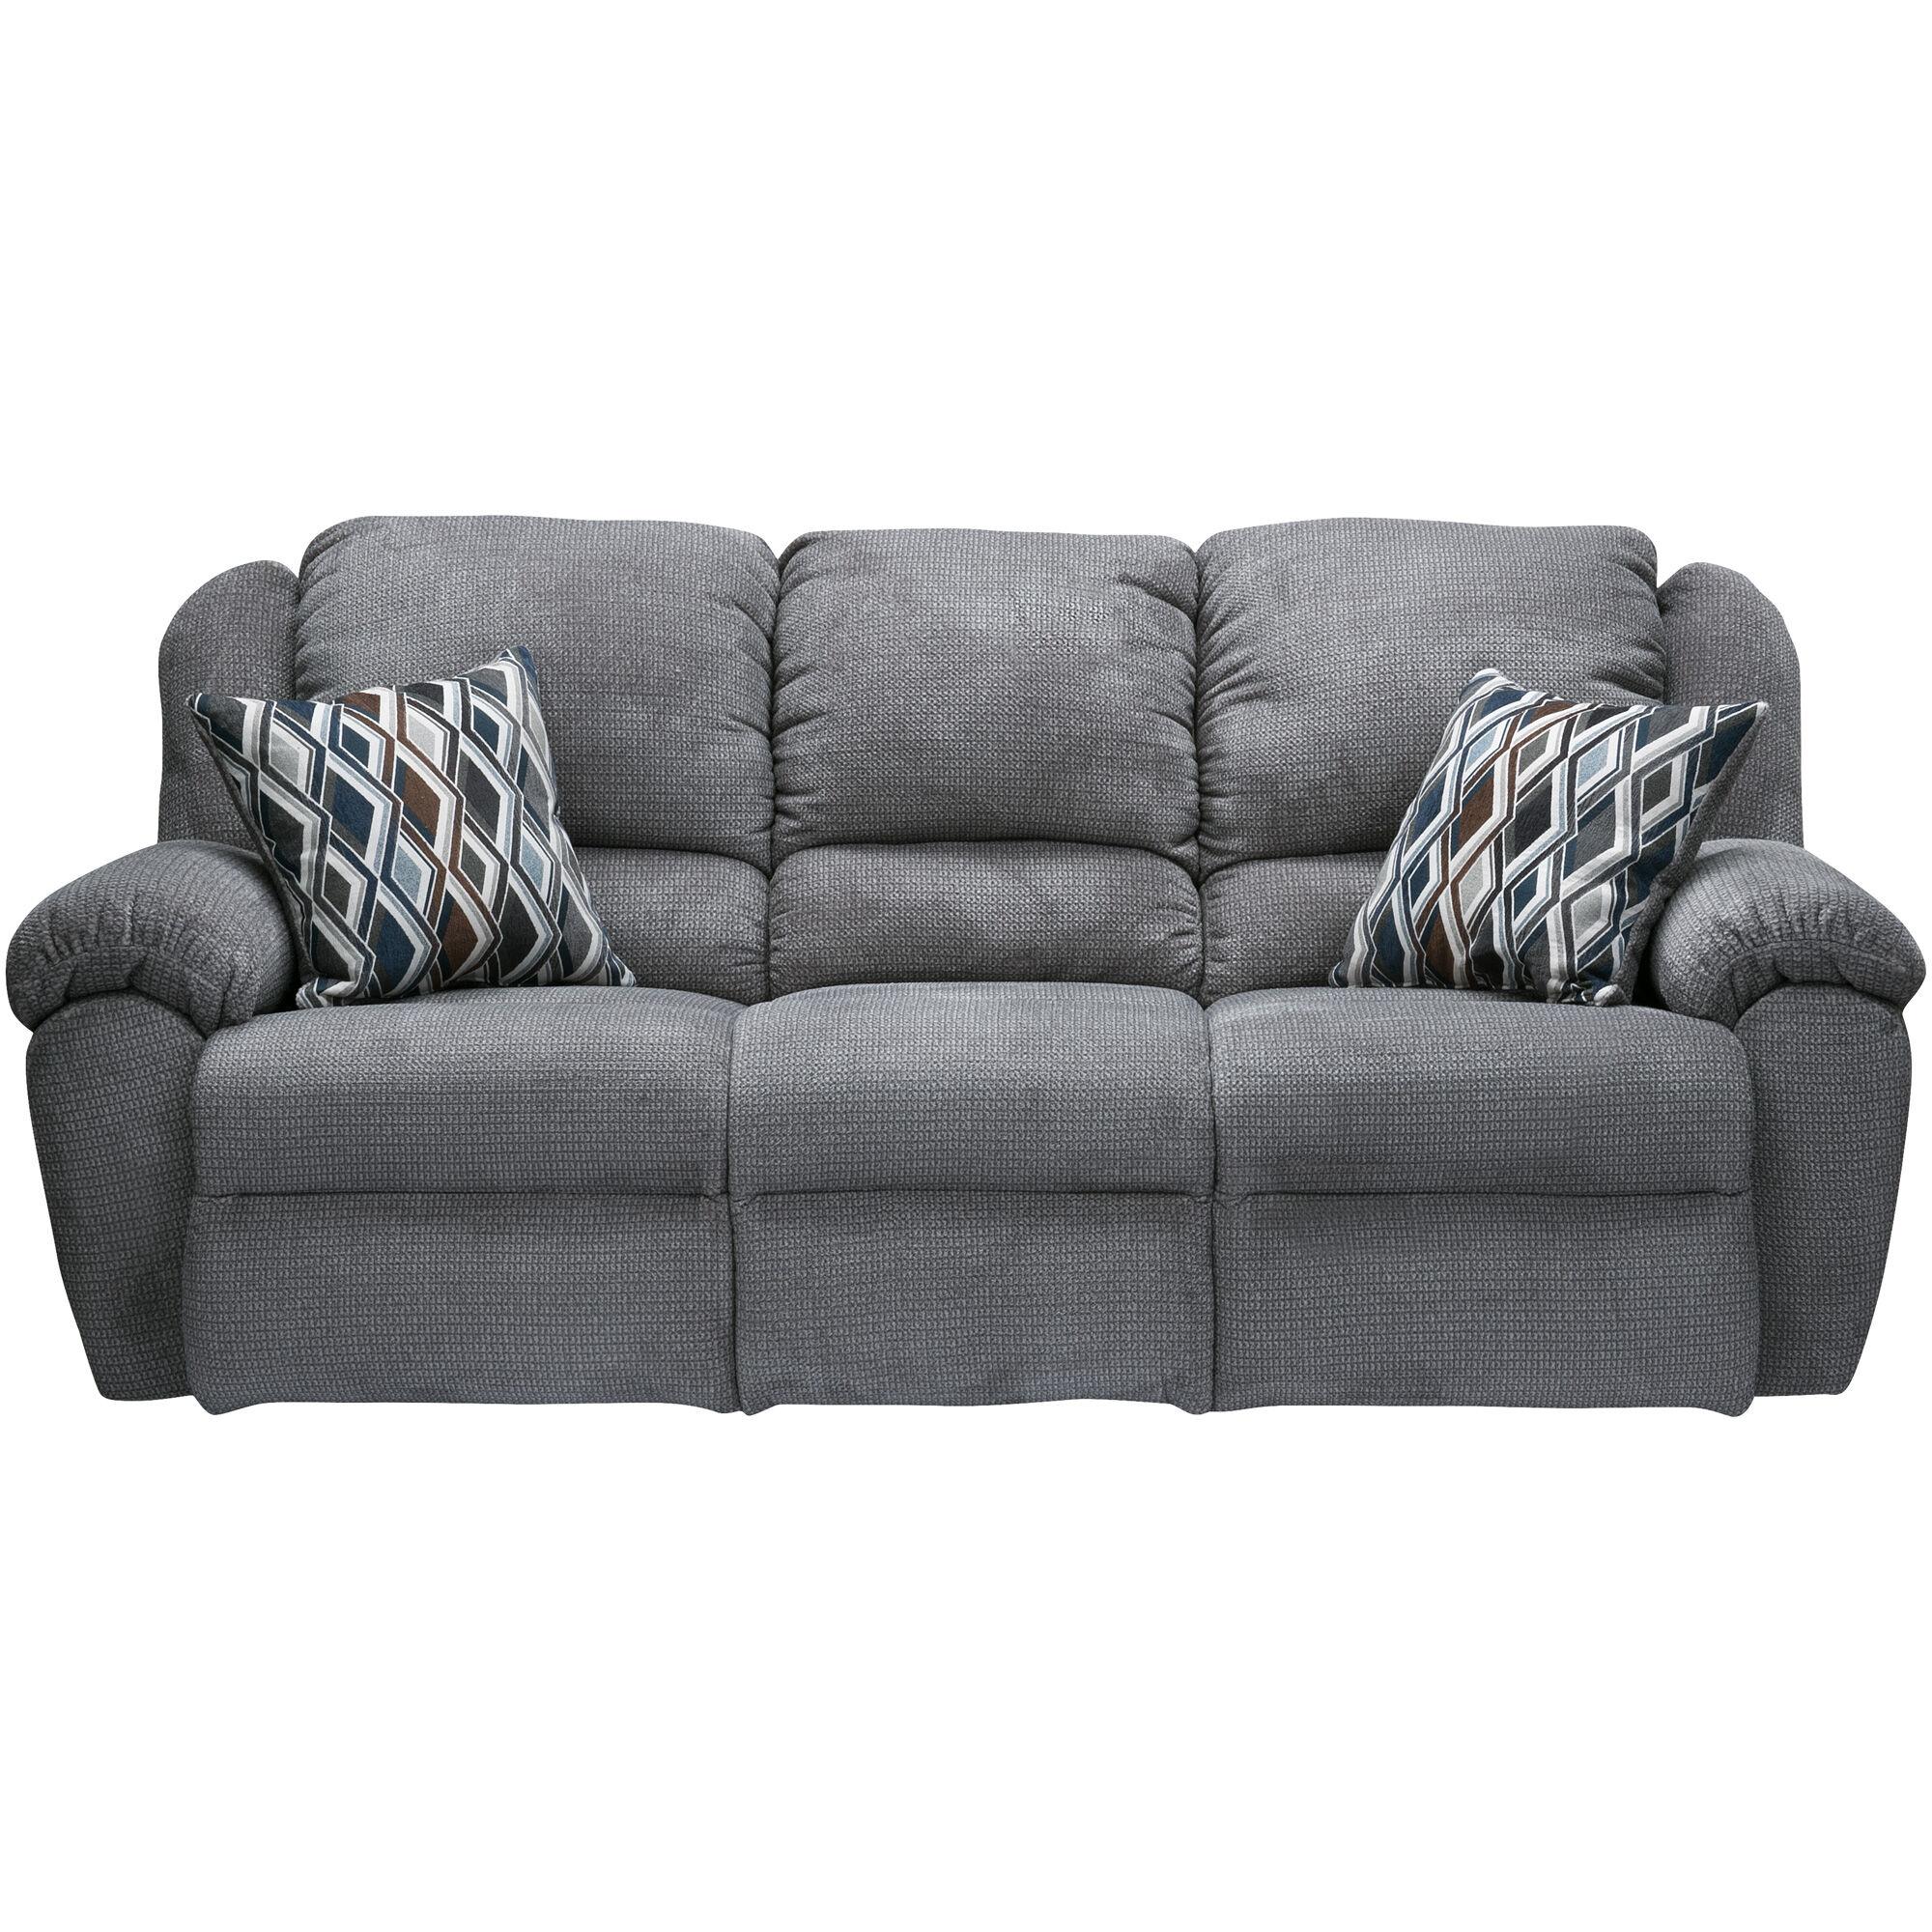 Genial Burnaby Gray Reclining Sofa